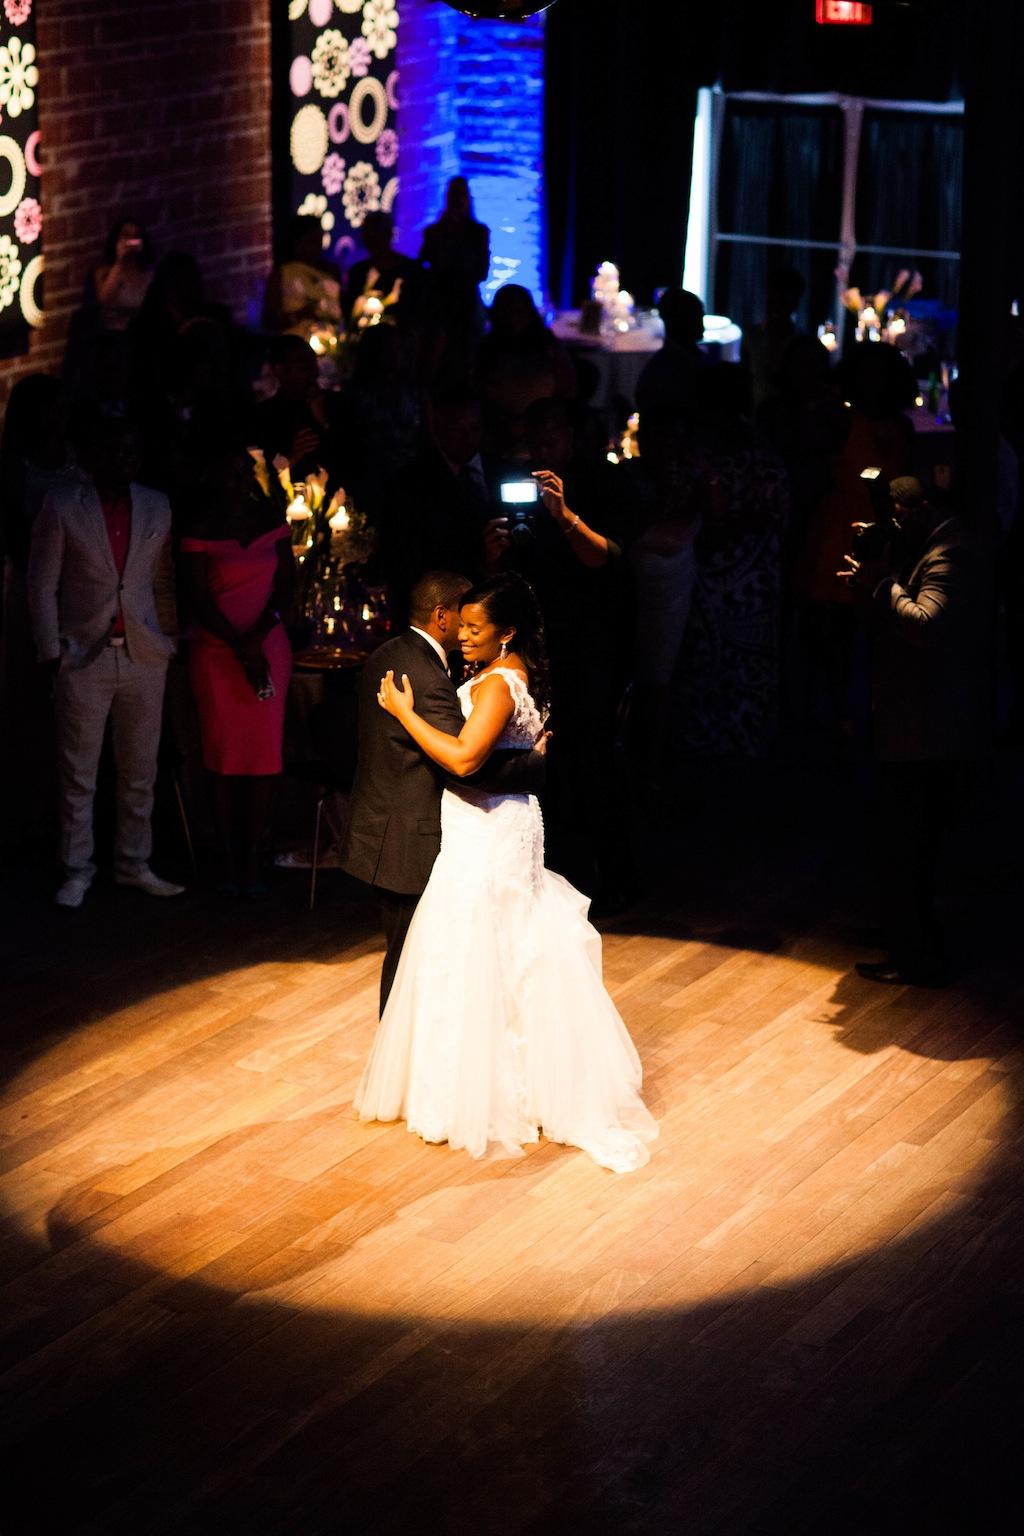 NOVA 535 Wedding - Midsummer Night's Dream Wedding in Downtown St. Pete by 28Pixels Photography (4)